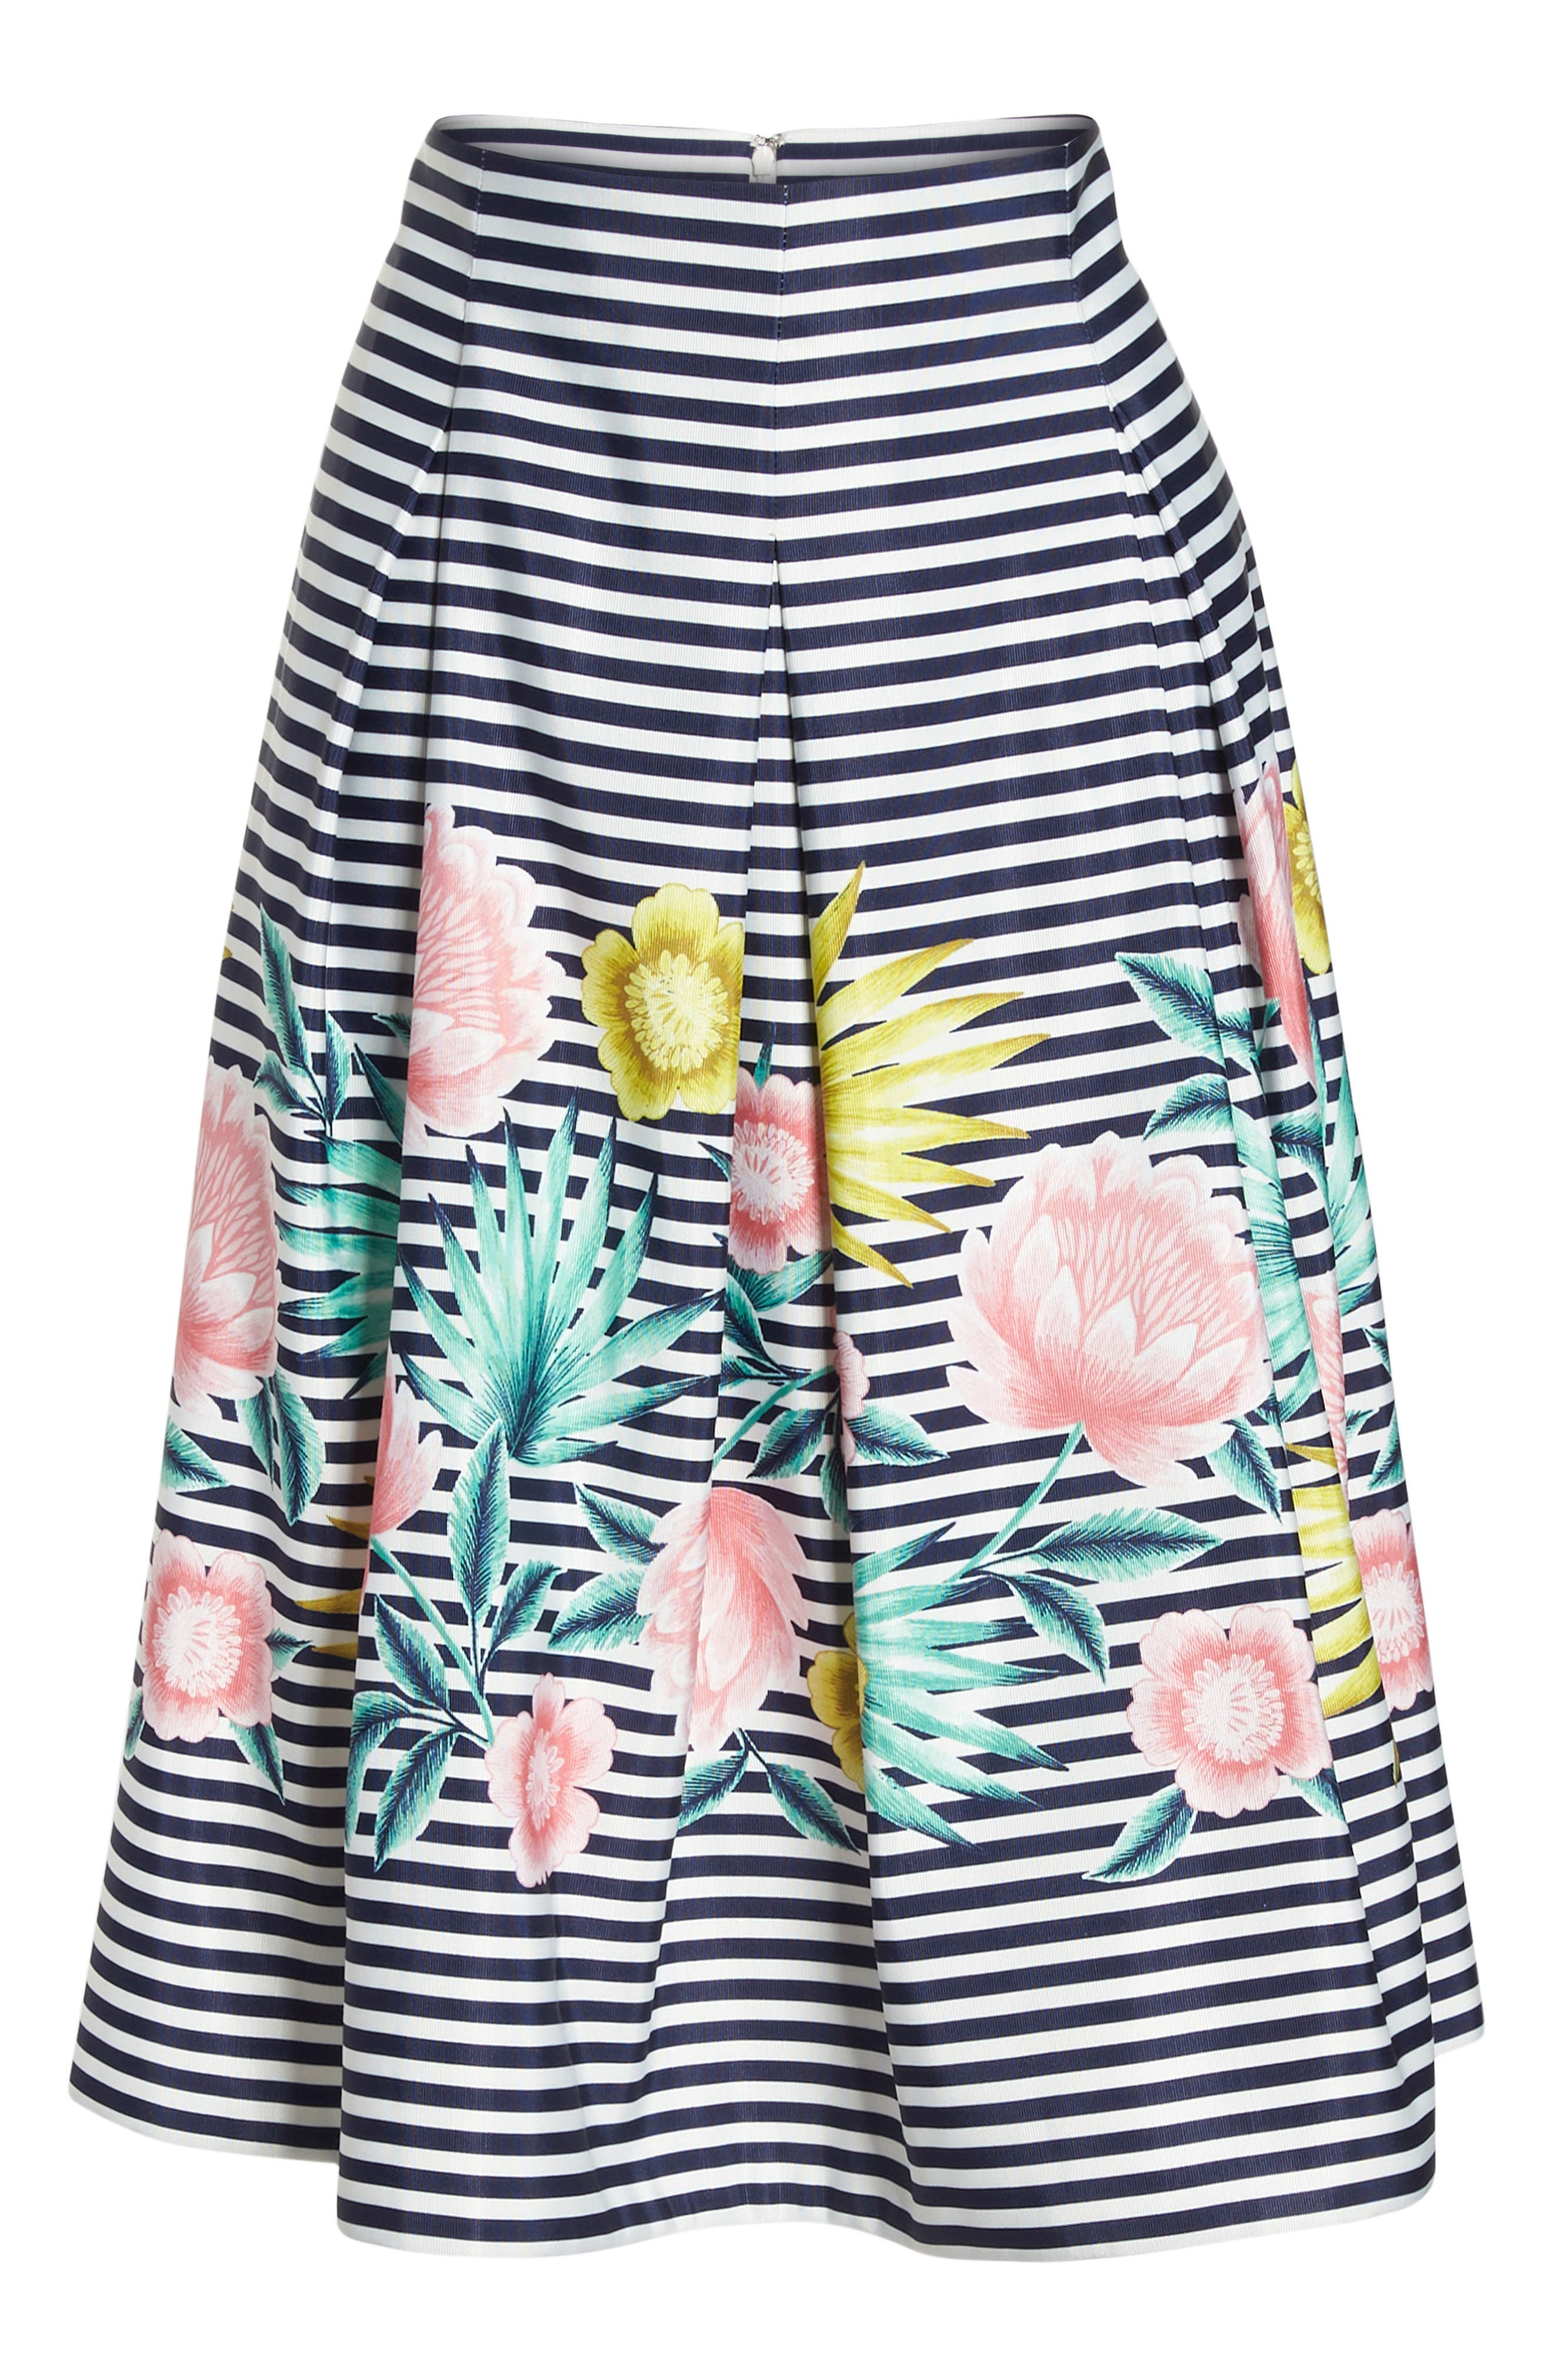 Floral & Stripe A-Line Skirt,                             Alternate thumbnail 7, color,                             Navy